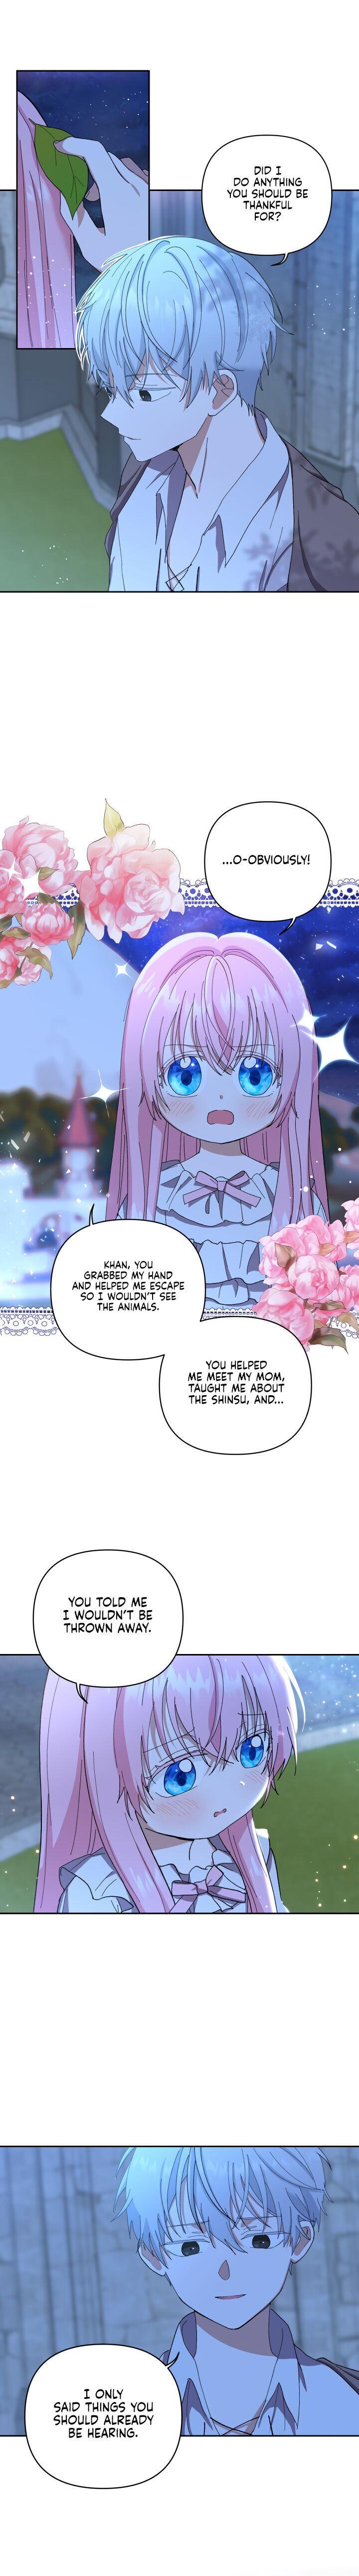 Baby Empress Chapter 22 page 15 - Mangakakalots.com